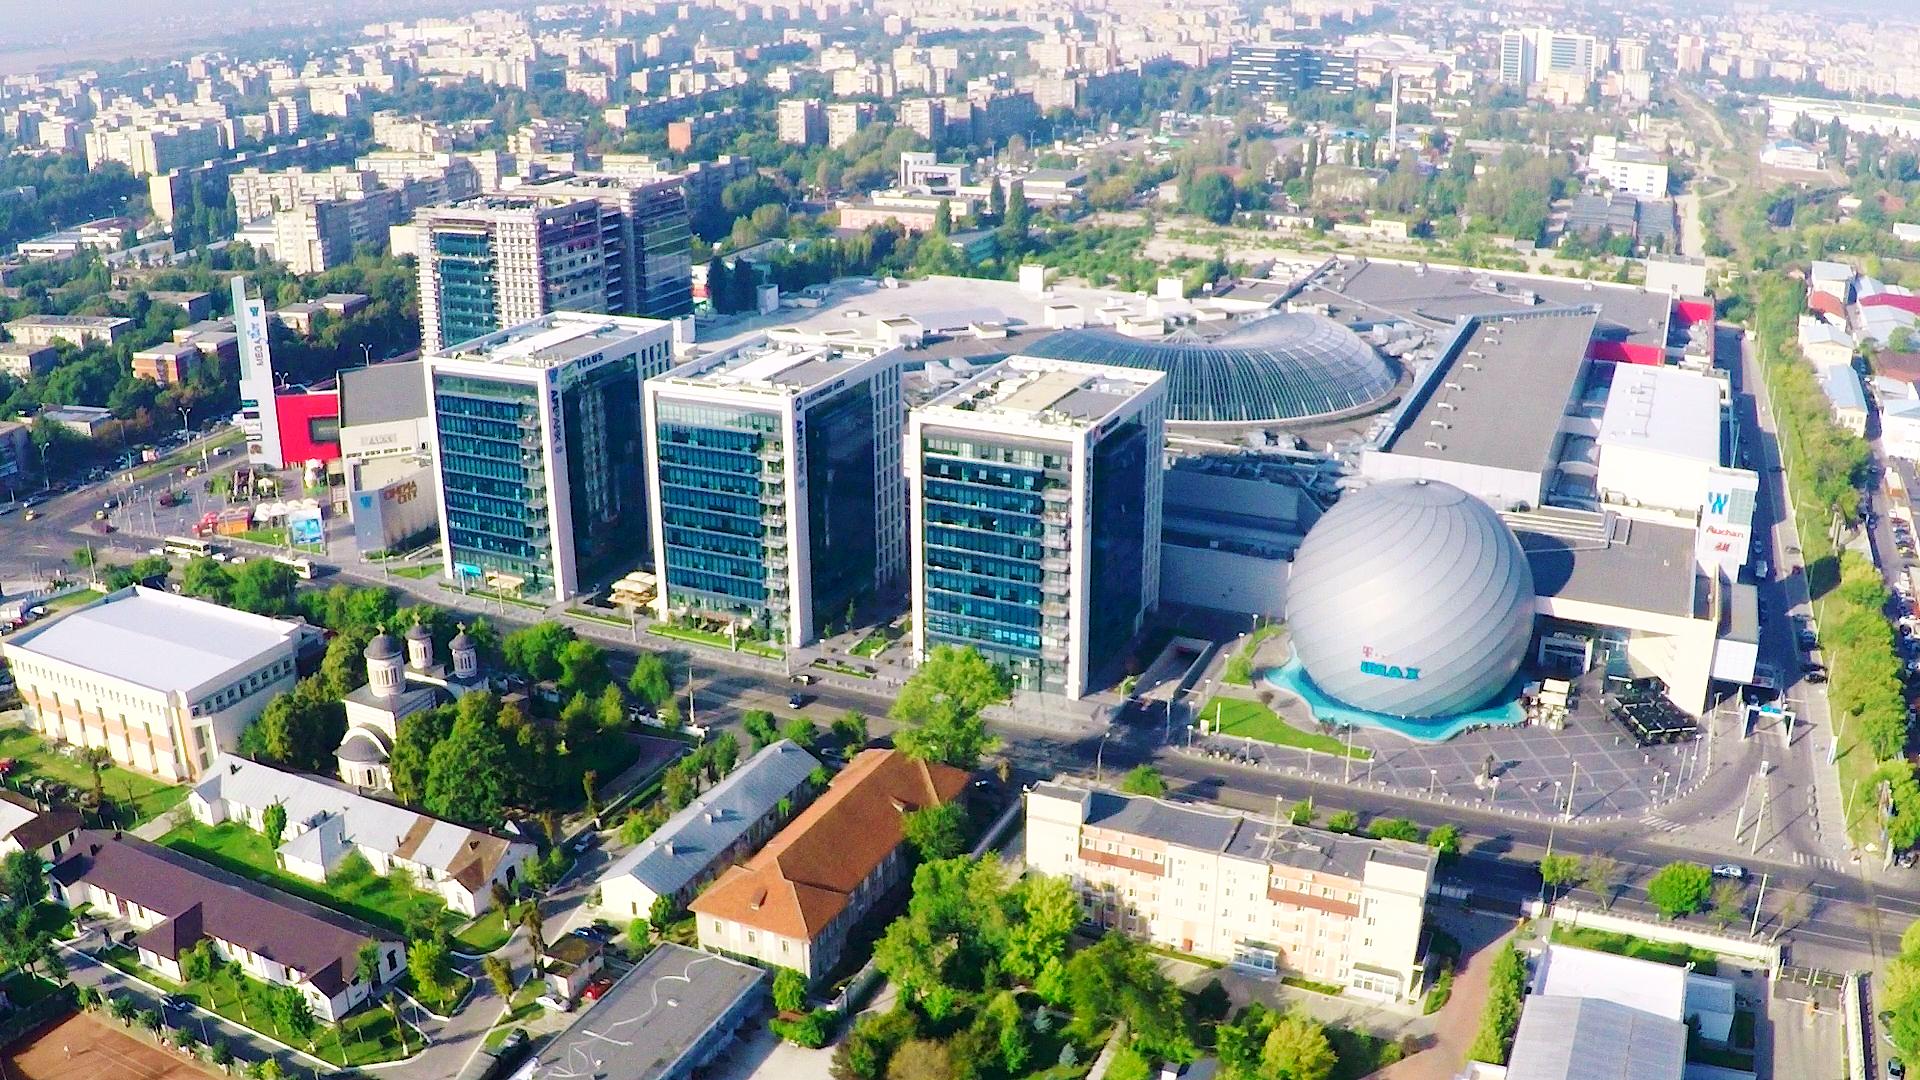 Romania's Dedeman, AFI Europe cancel deal for Bucharest office buildings